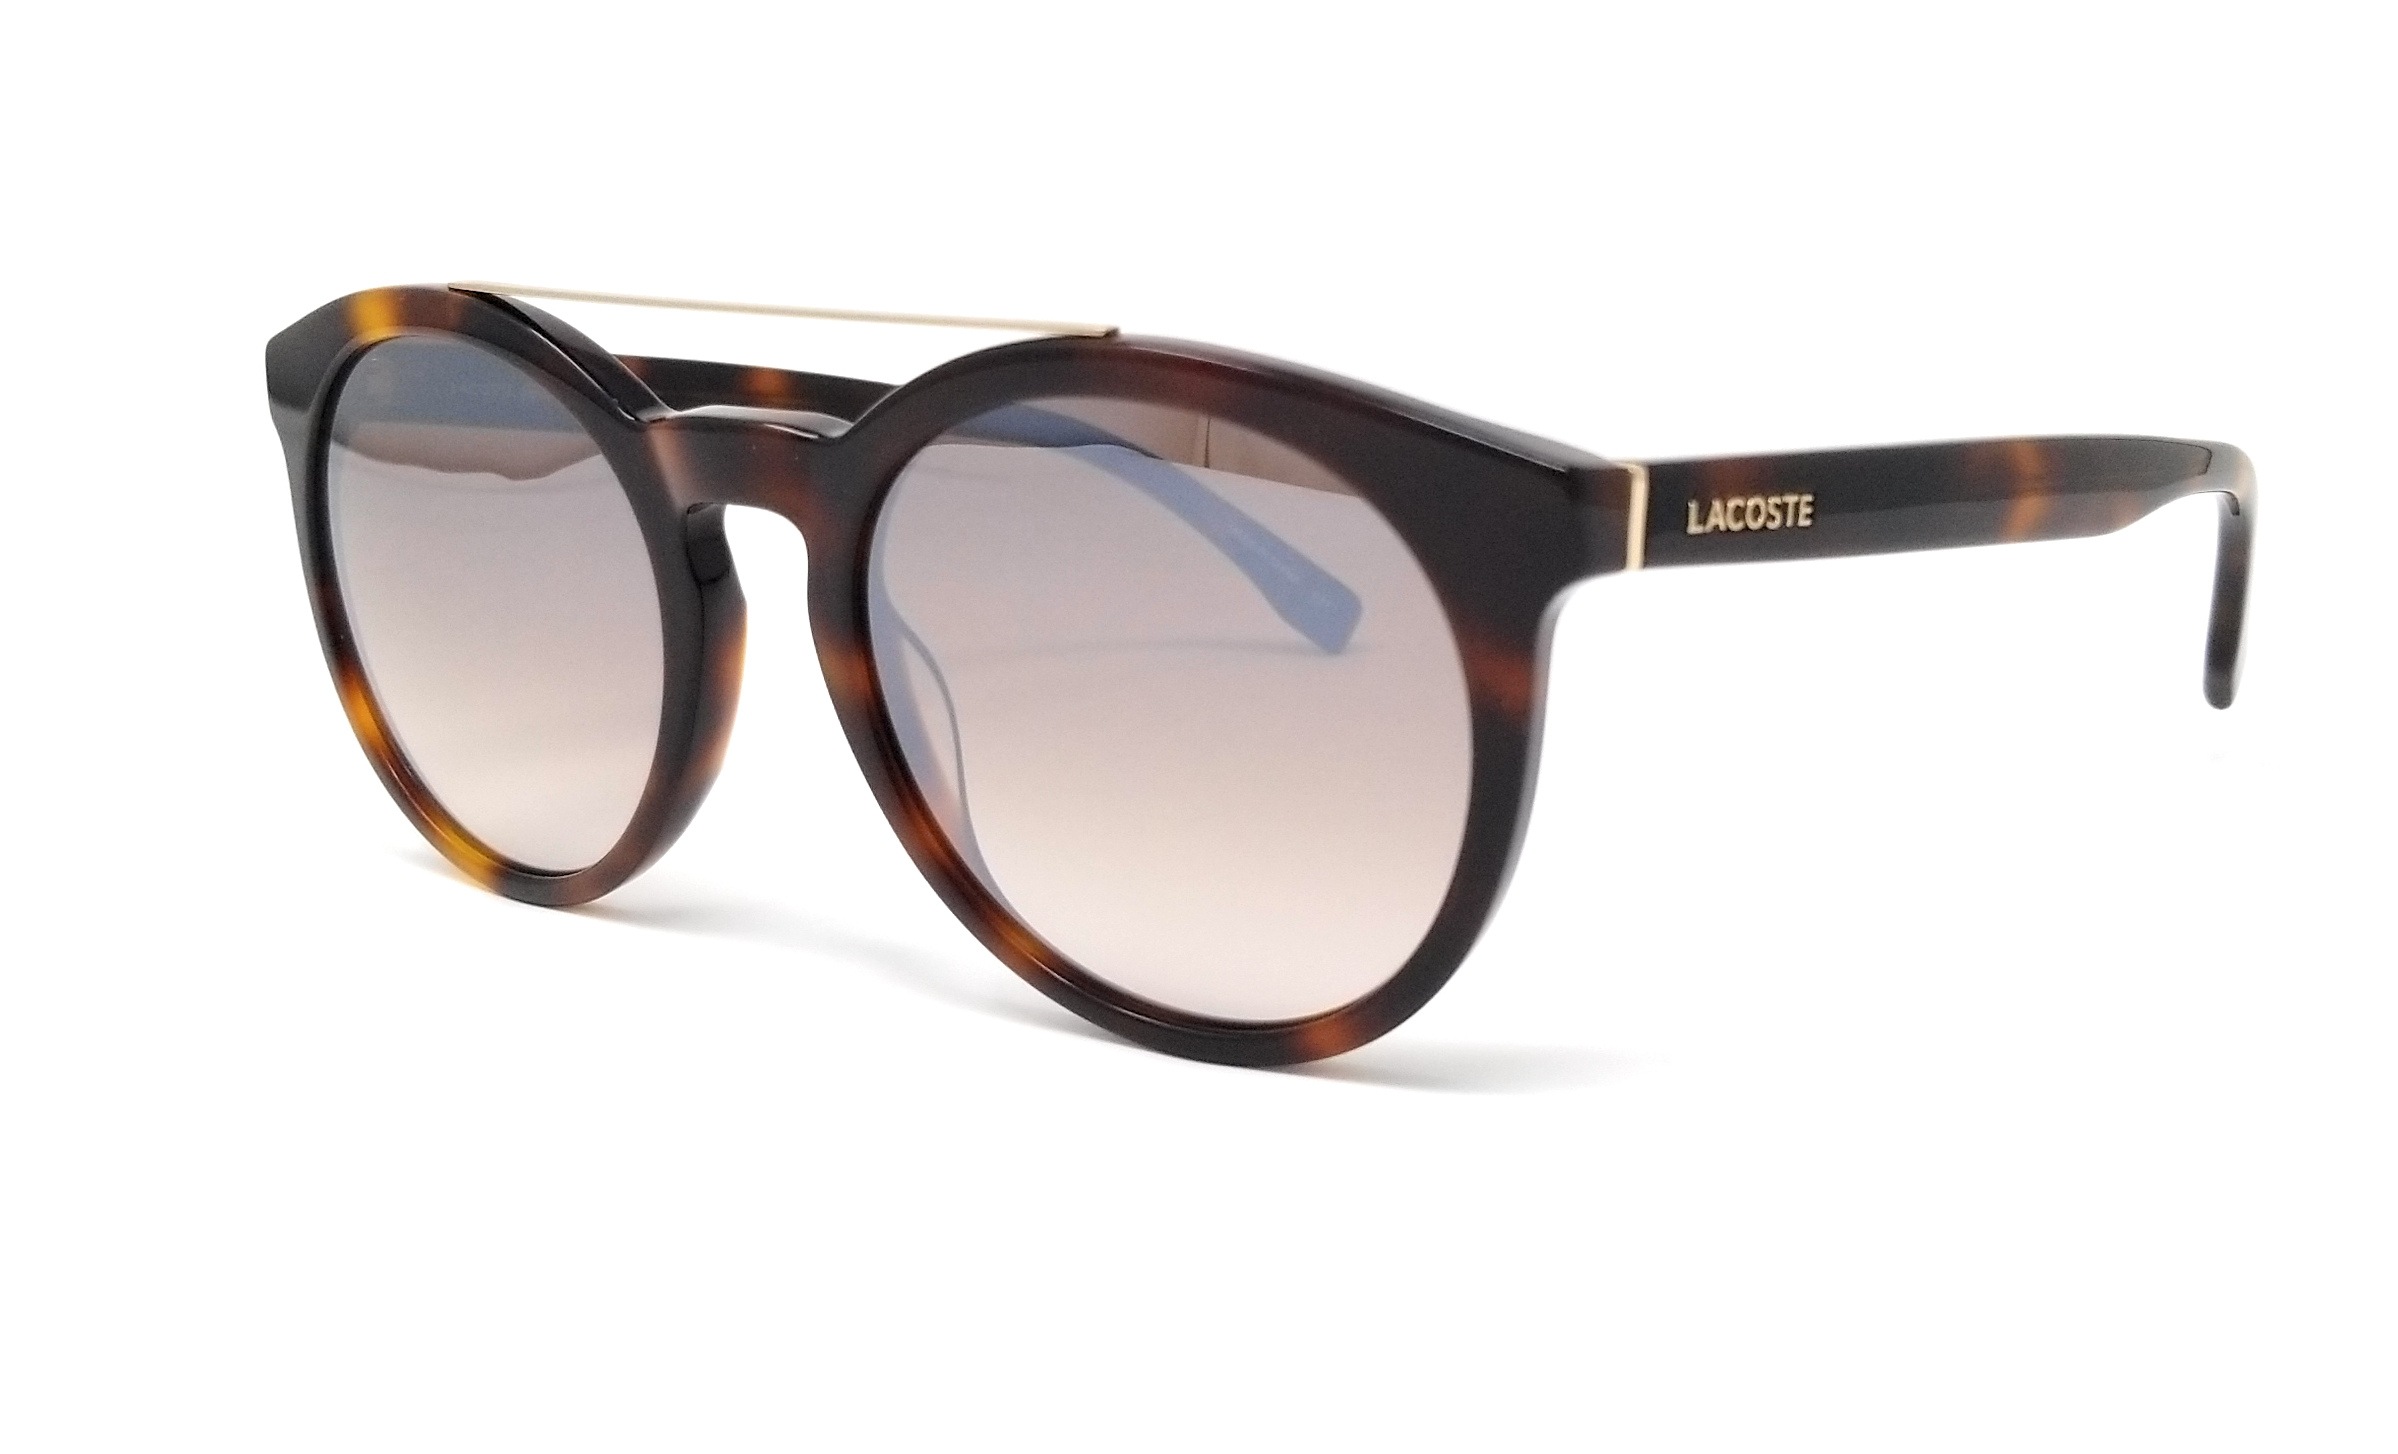 0f153c874fd9 LACOSTE Sunglasses L821S 214 Havana Oval 52x20x145 886895284721